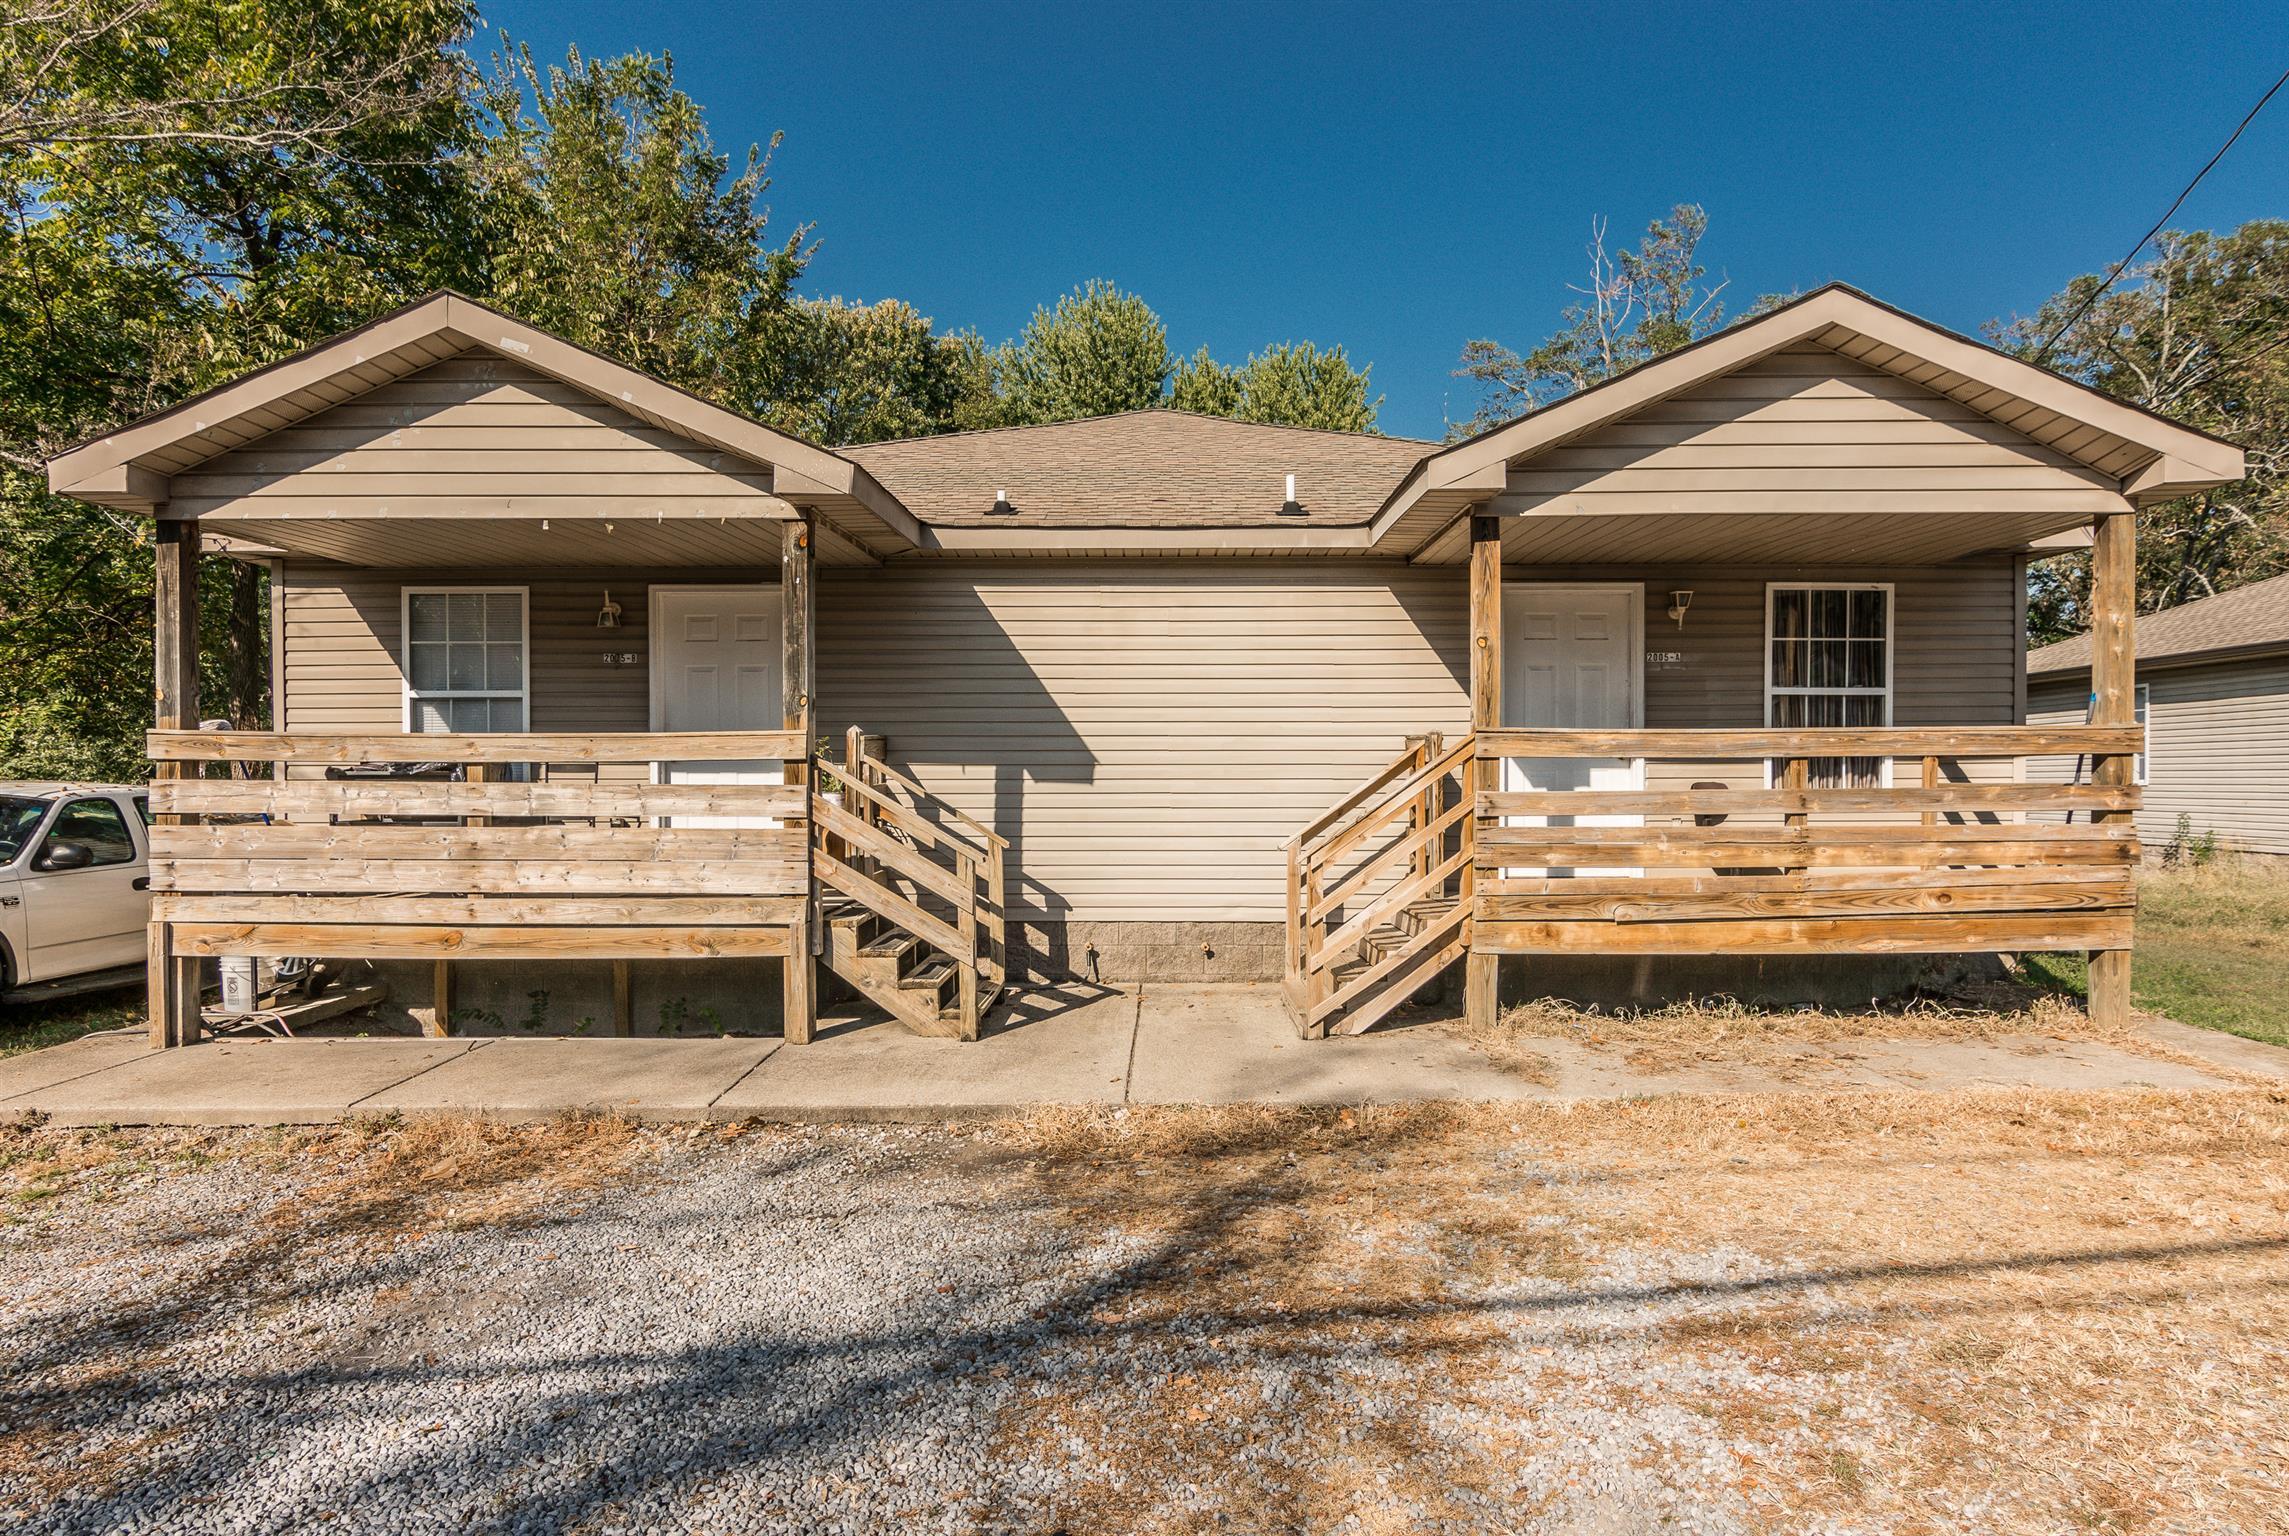 2005 Woodland St, Springfield, TN 37172 - Springfield, TN real estate listing